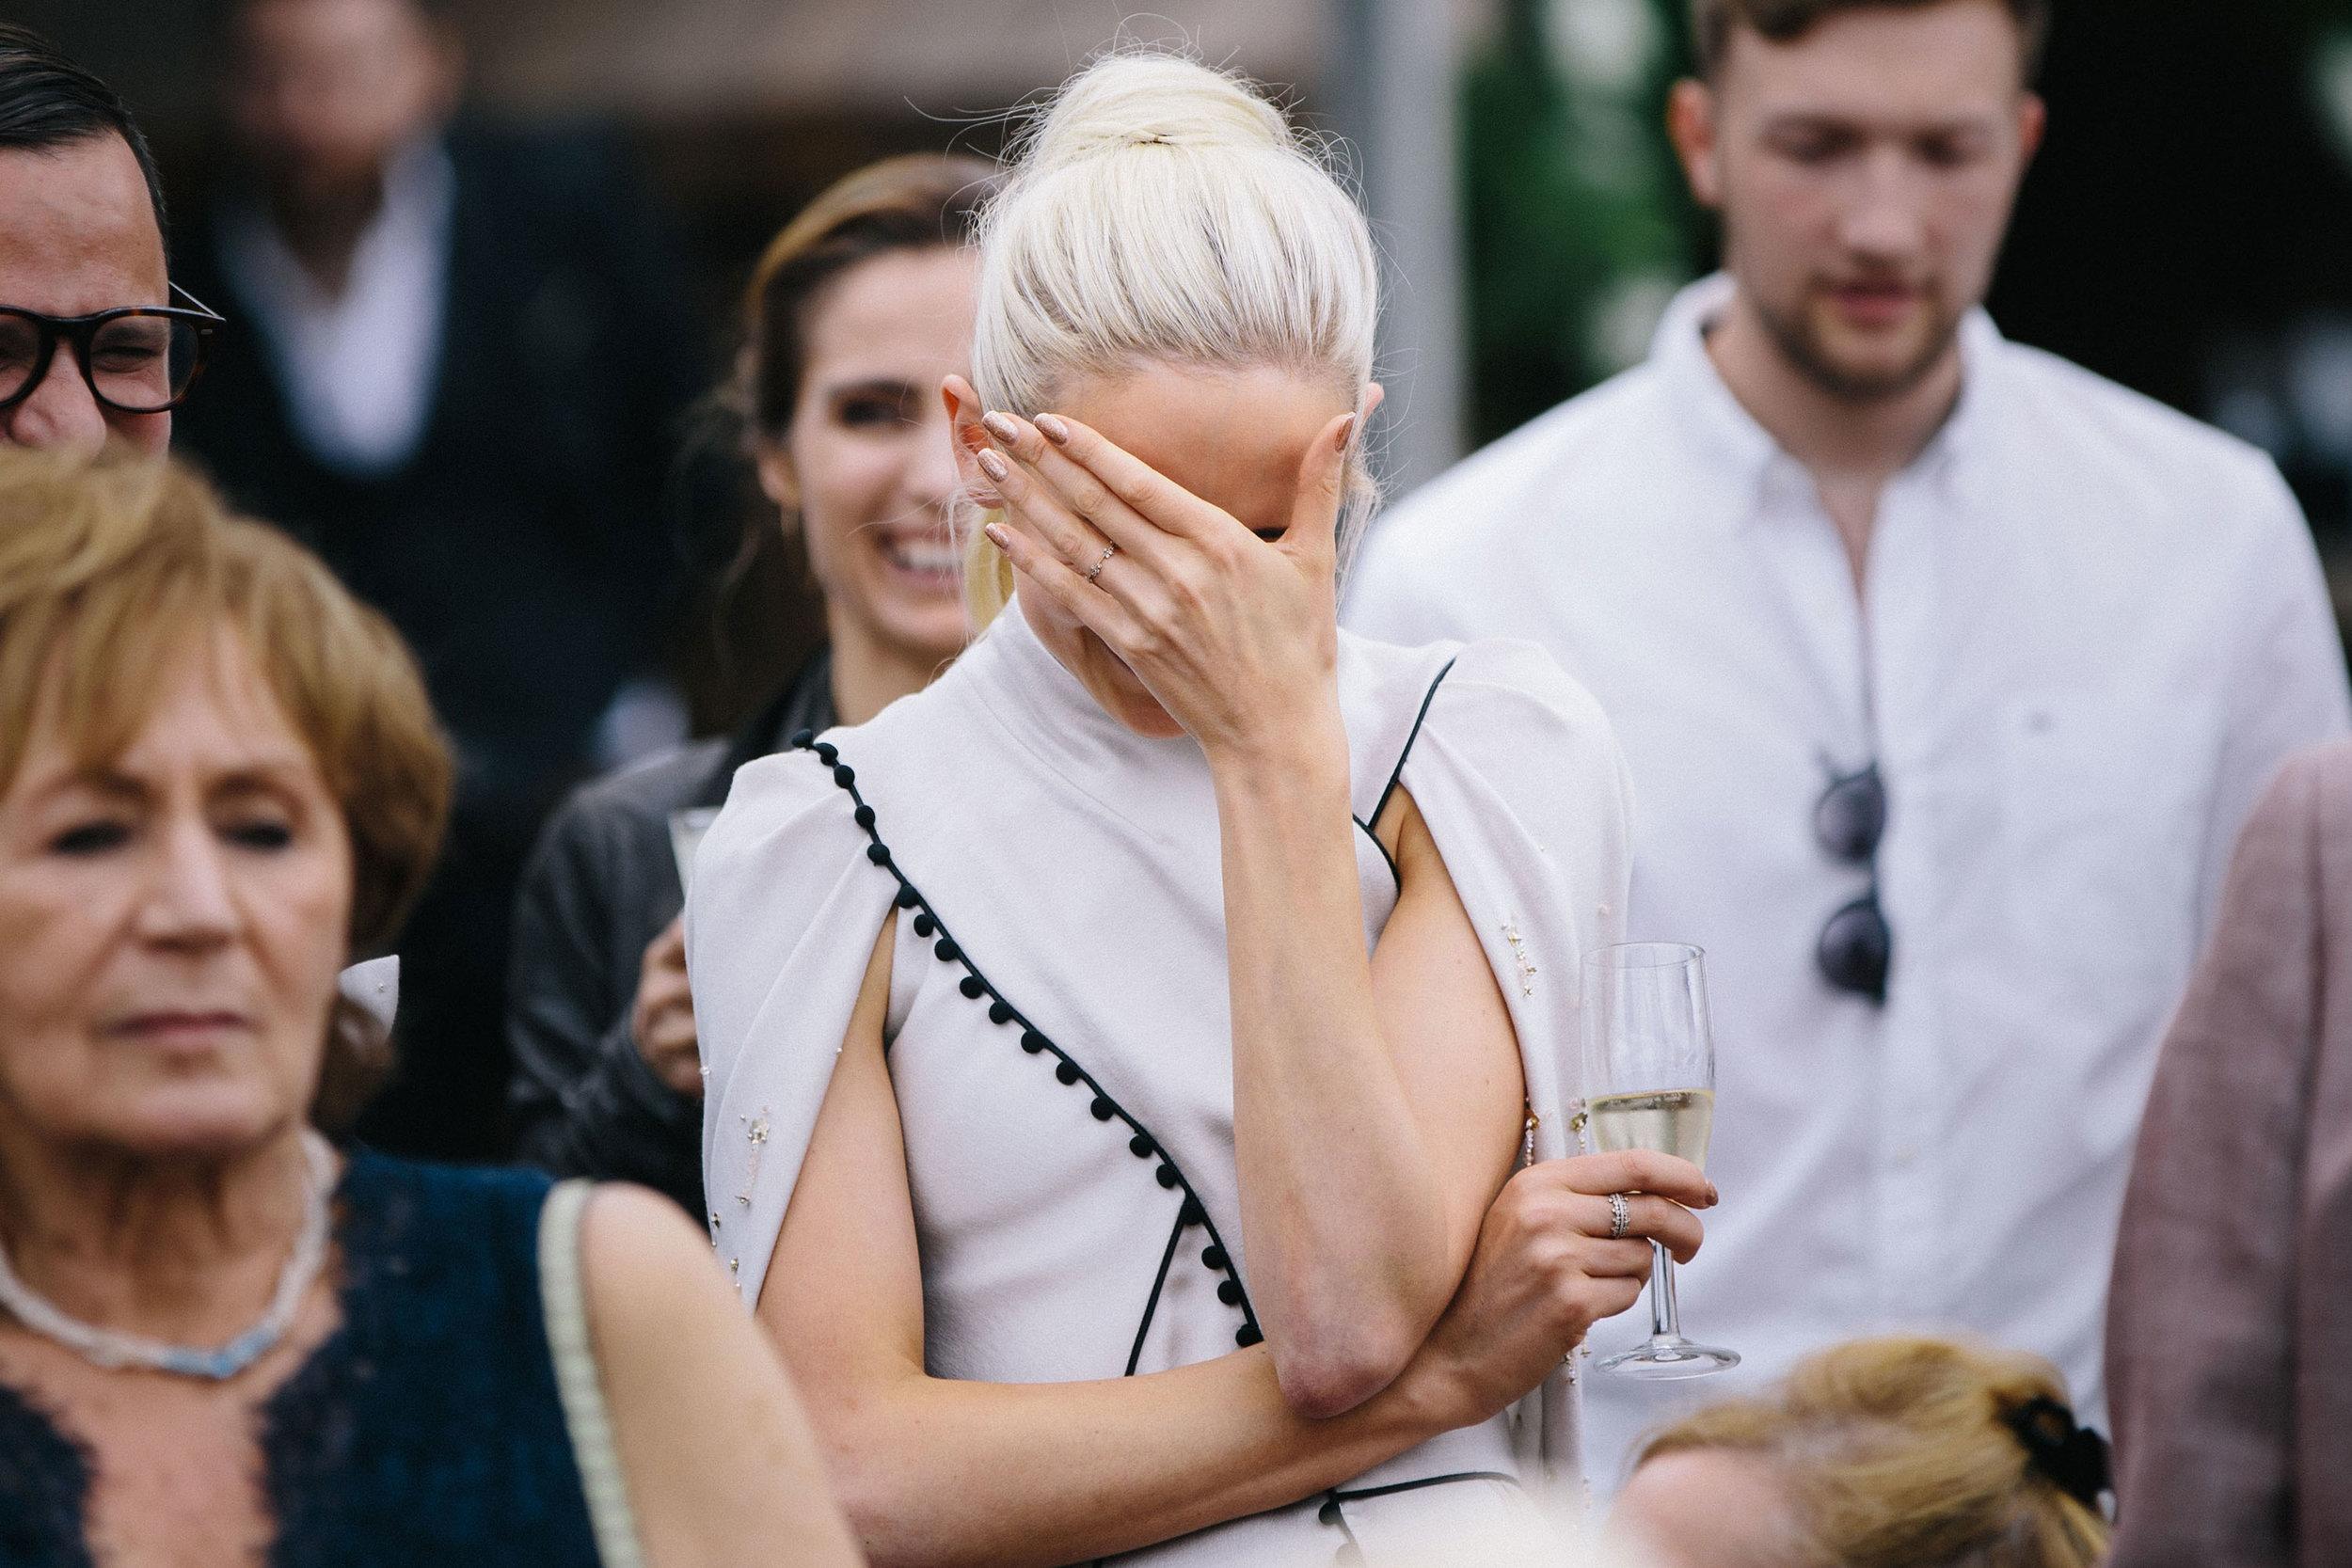 West-London-wedding-party-in-Ladbroke-Grove-Michael-Newington-Gray-40.jpg